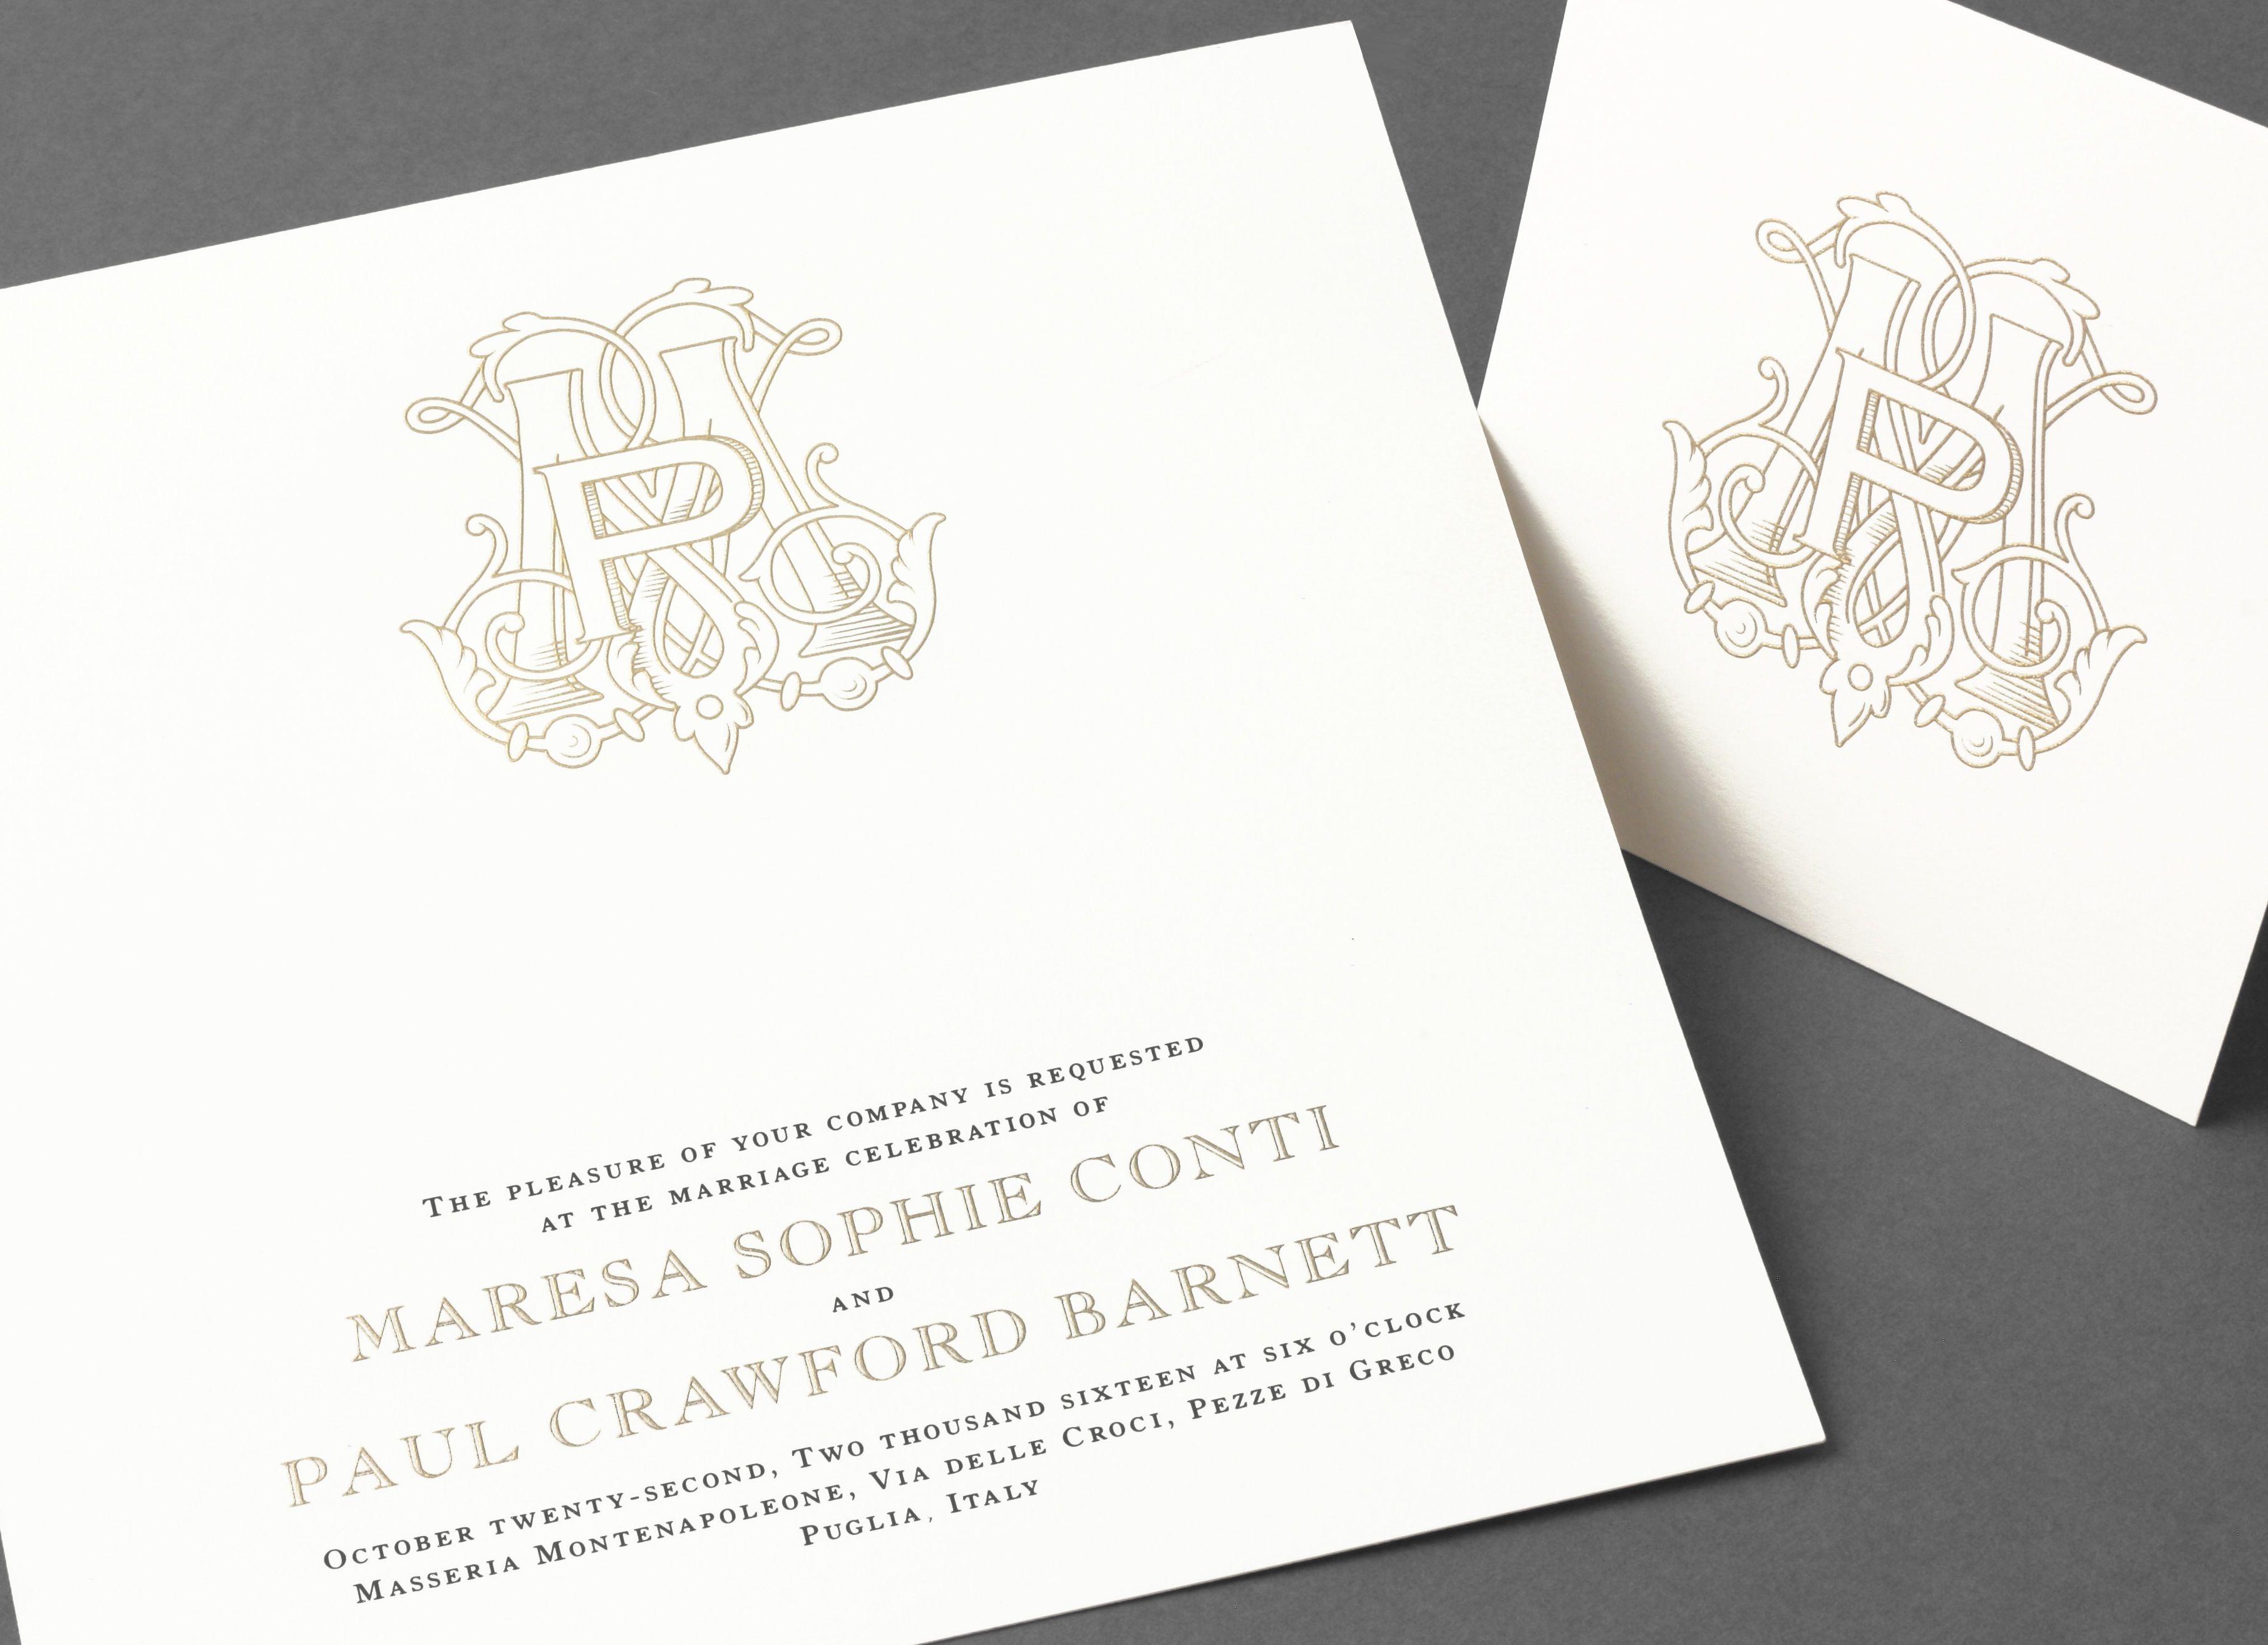 crane wedding invitations Vera Wang extra large square wedding invitation with a gold monogram